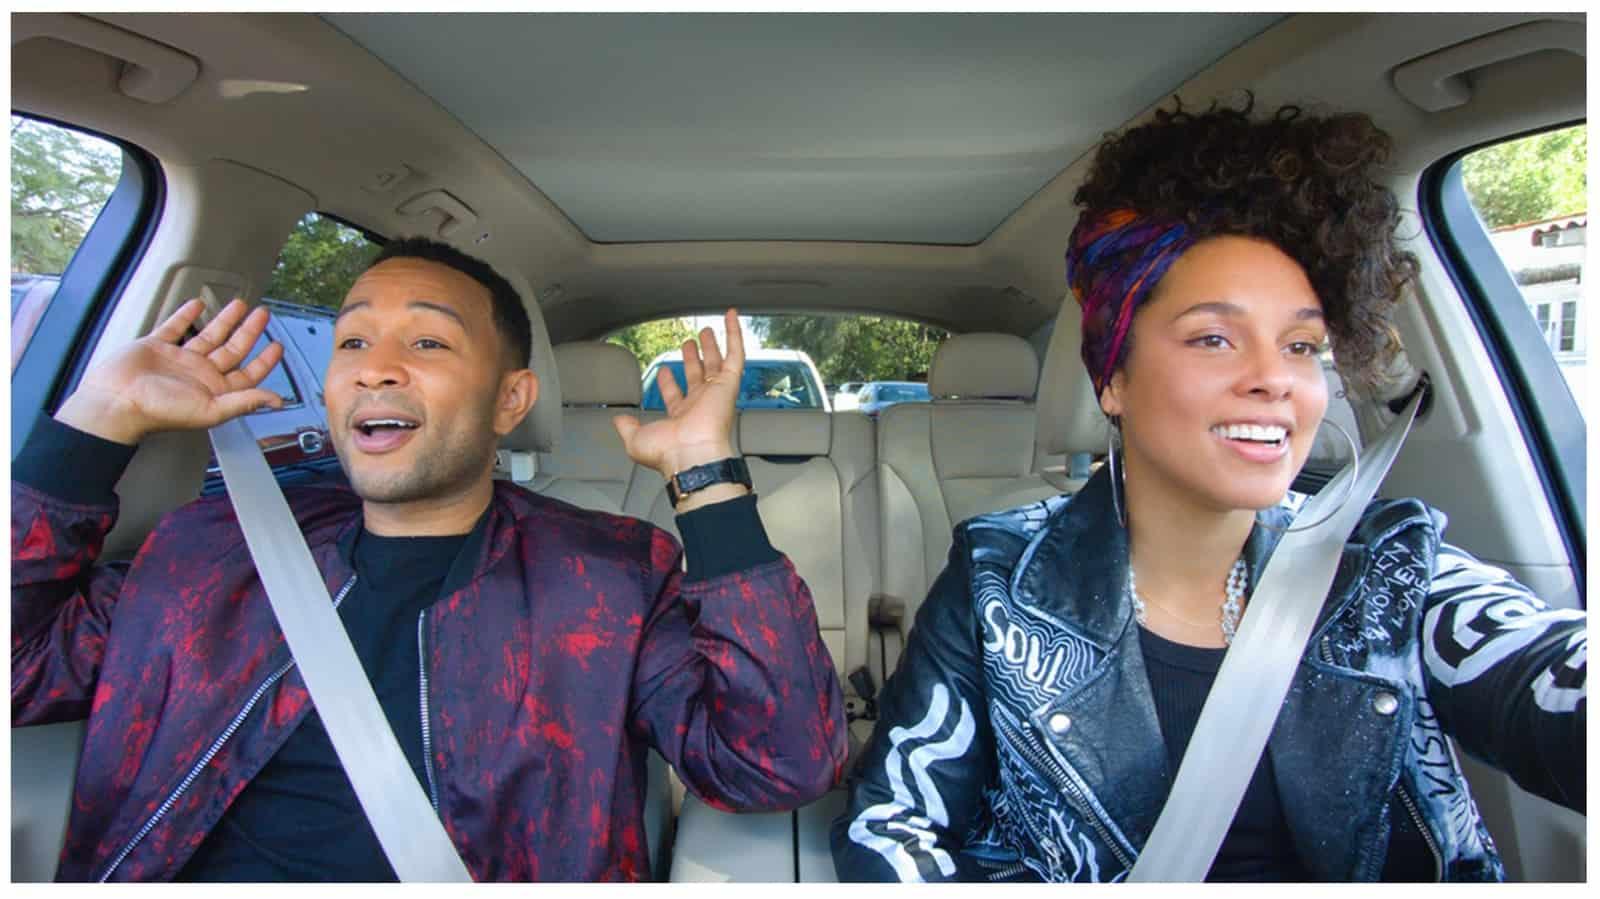 Apples Carpool Karaoke kommer den 8 augusti